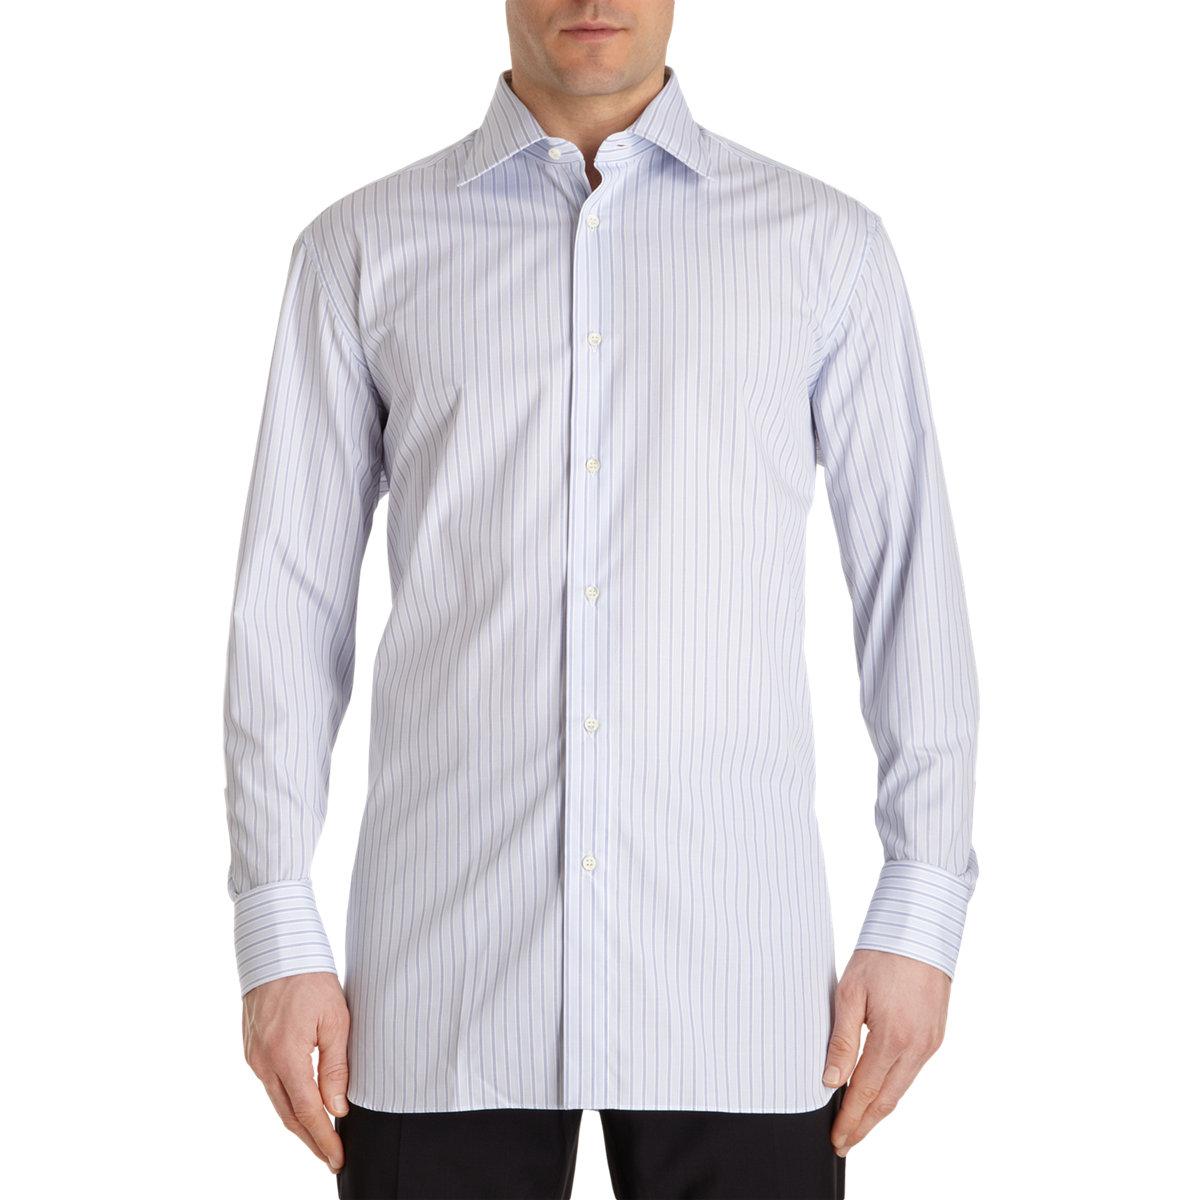 Lyst battistoni striped spread collar shirt in blue for men for What is a spread collar shirt